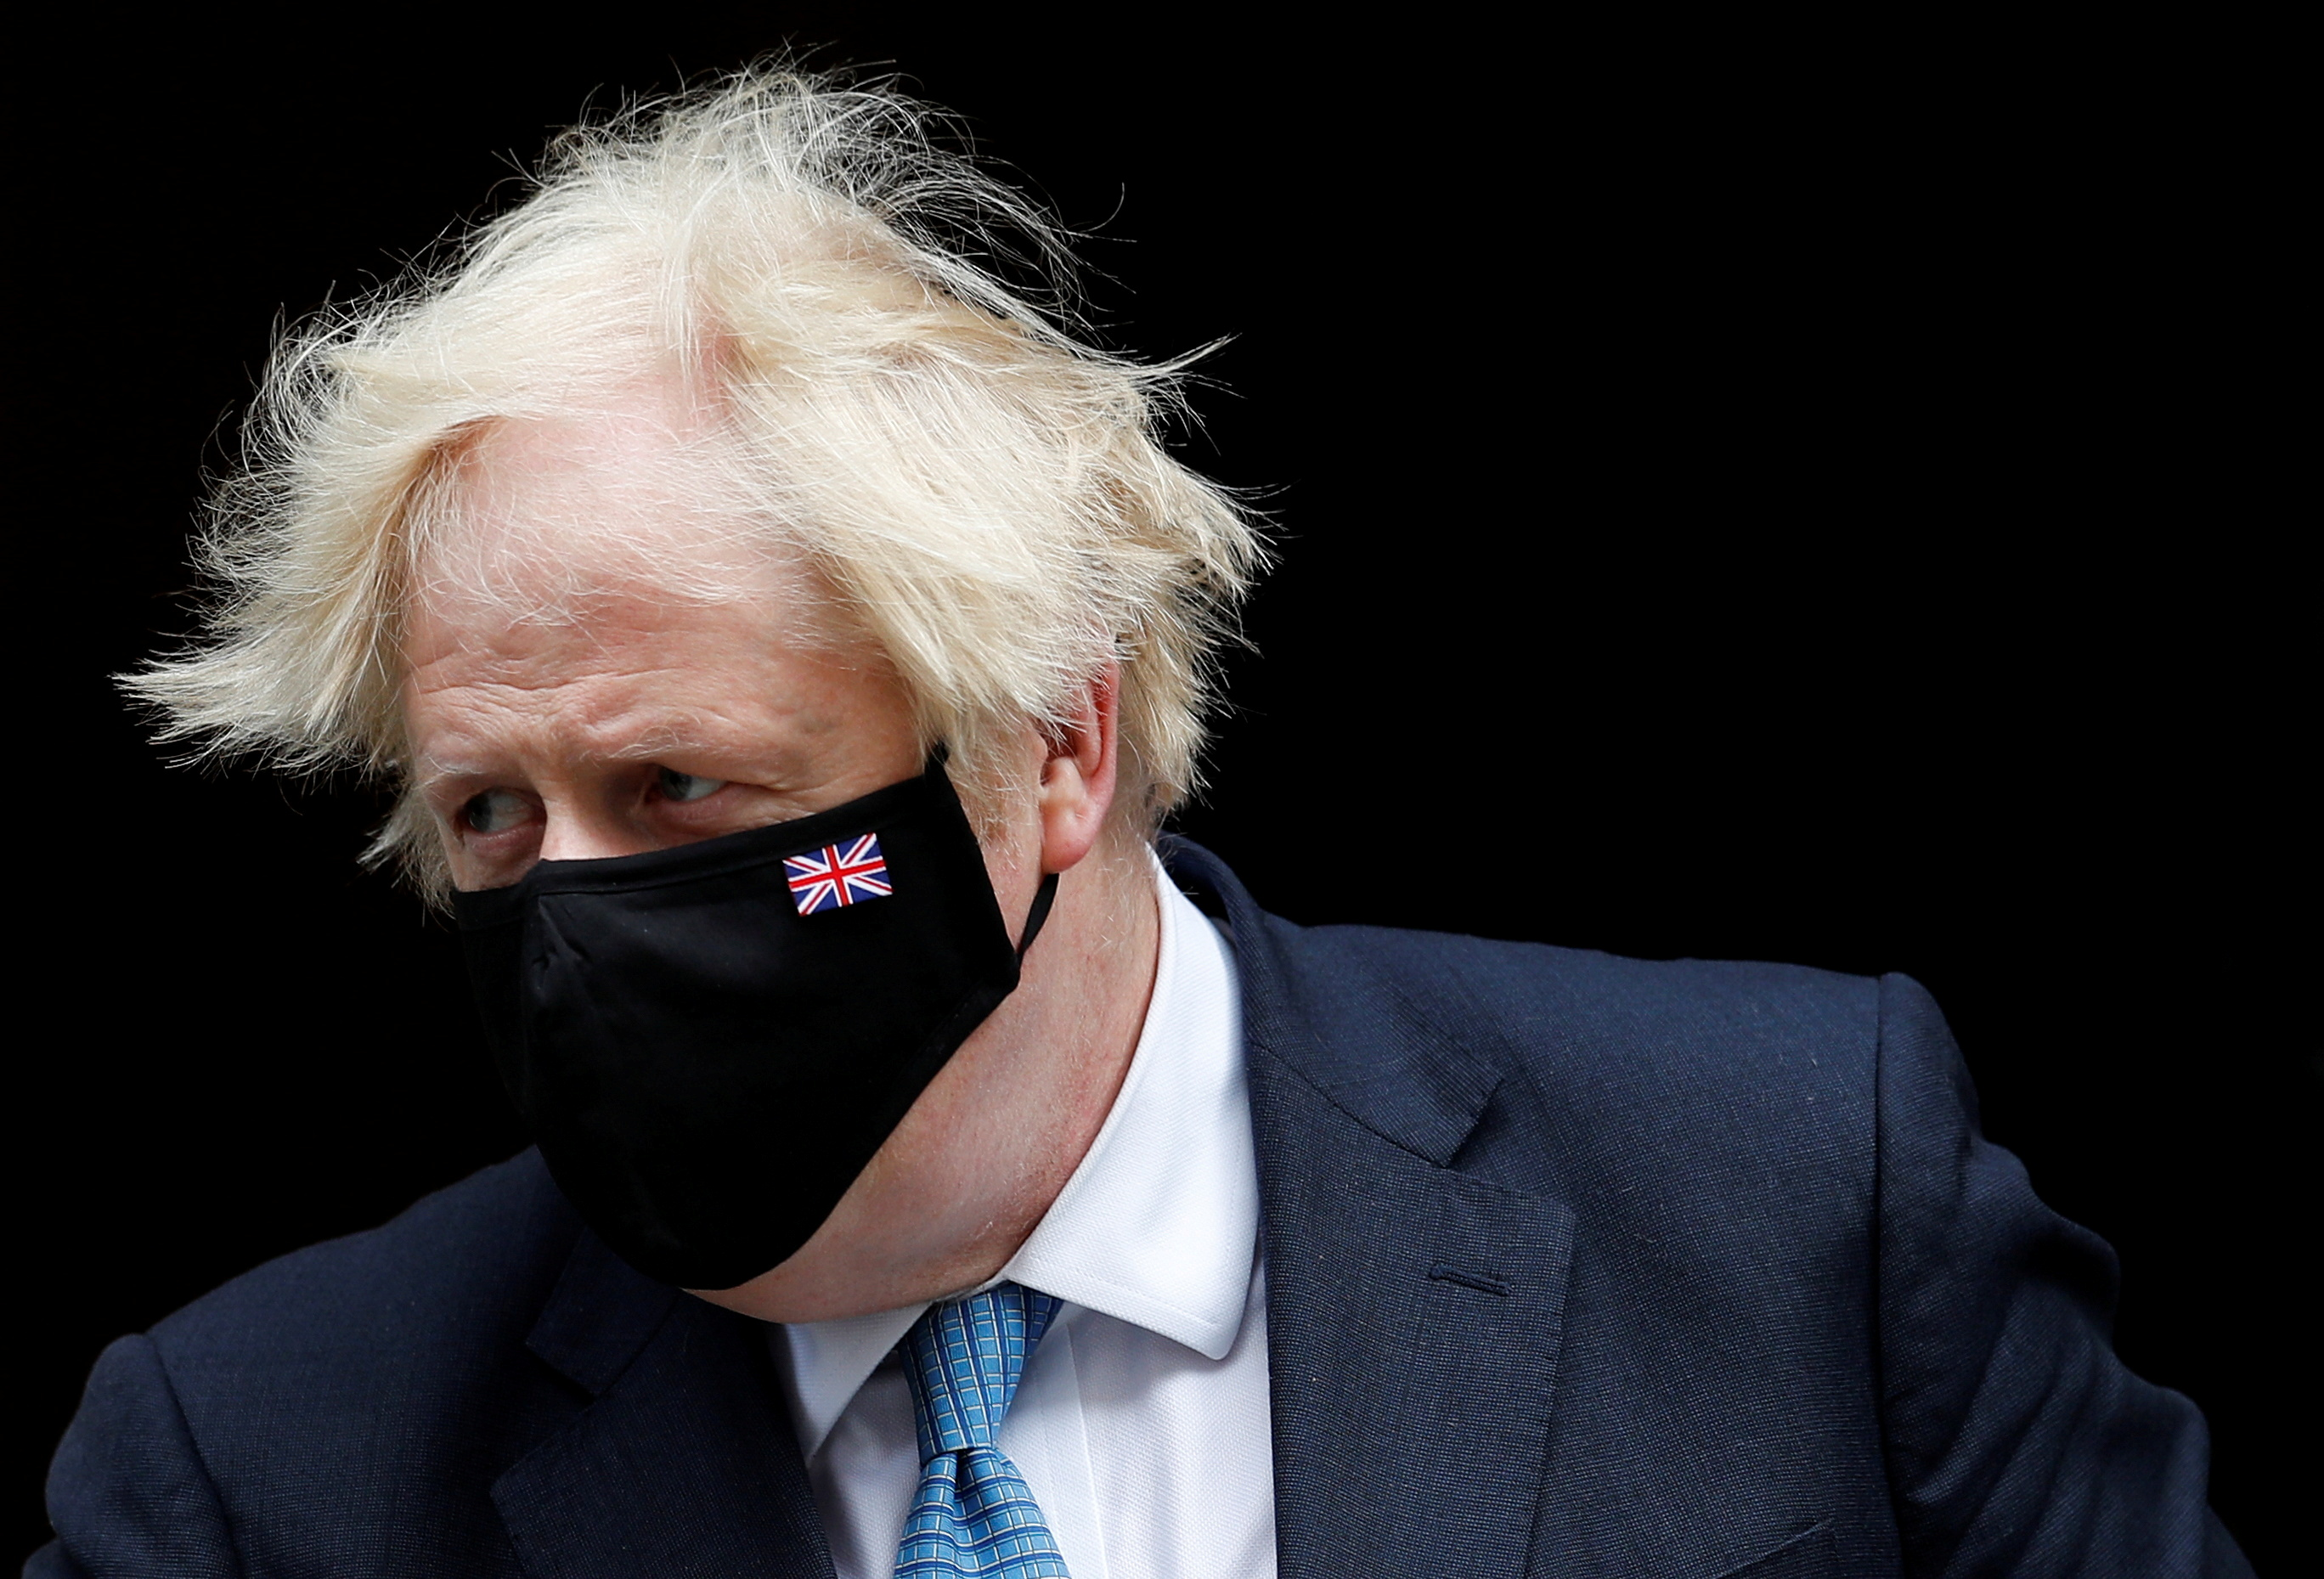 Britain's Prime Minister Boris Johnson walks on Downing Street in London, Britain, July 14, 2021. REUTERS/Peter Nicholls